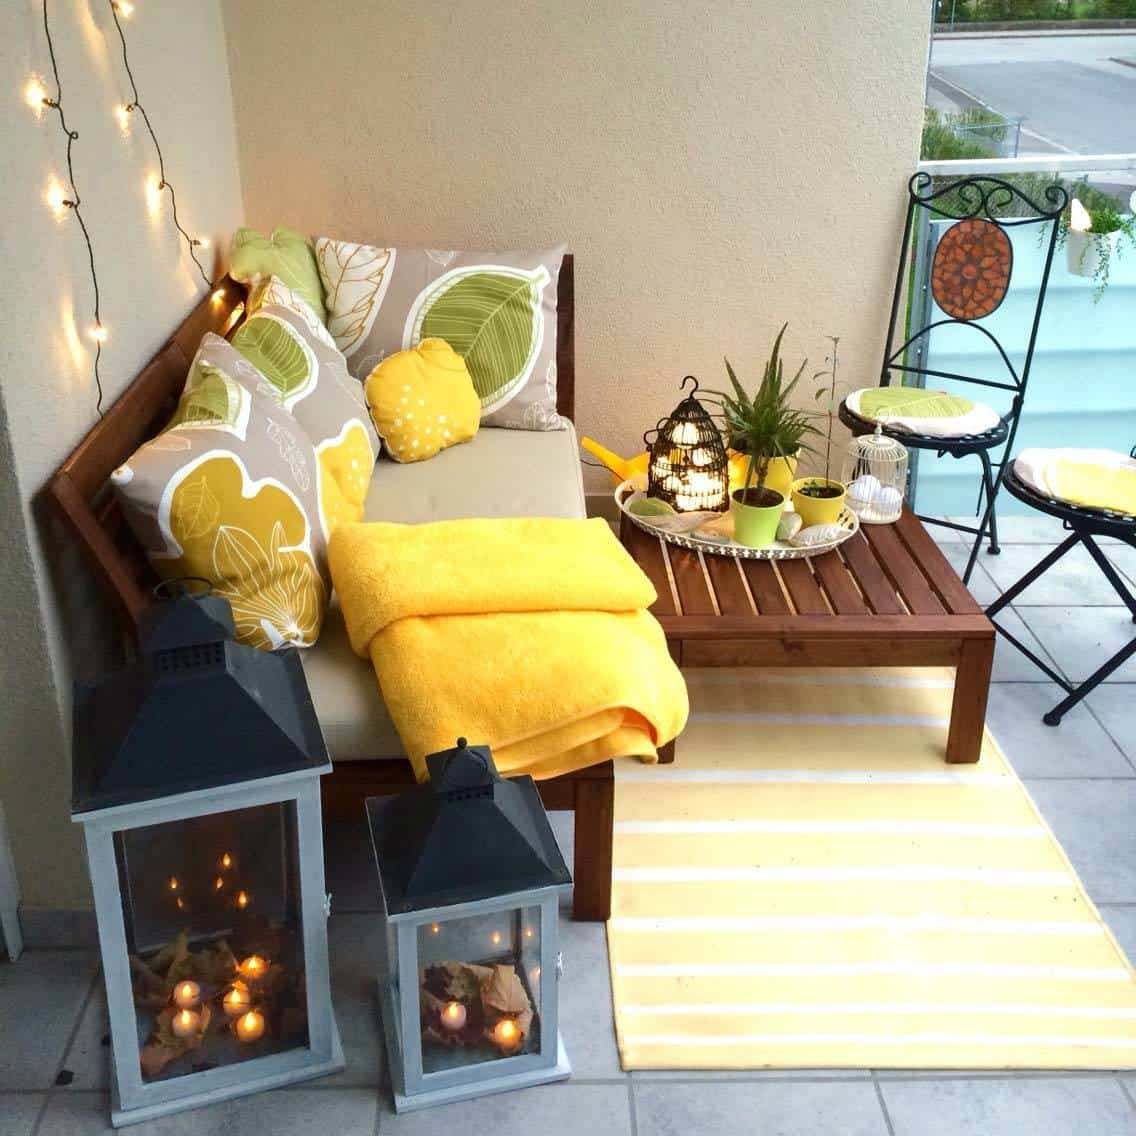 Fabulous-Spring-Balcony-Decor-Ideas-03-1 Kindesign